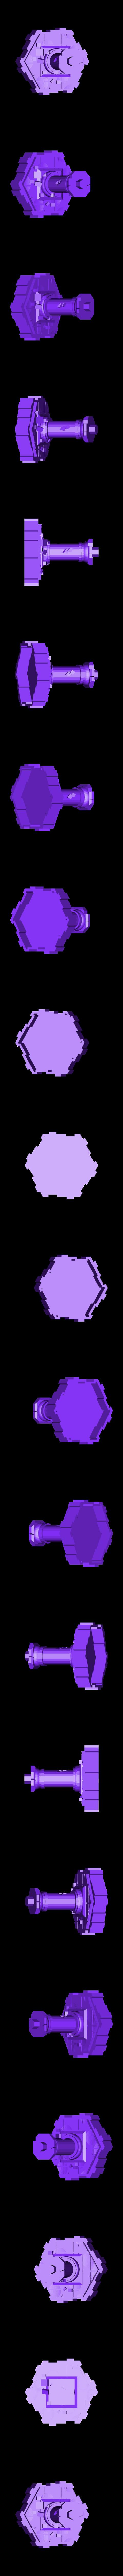 Hex_Pillar_Ruins_No_Top.stl Download free STL file Locking Hex Stone Pillars • 3D printable design, mrhers2